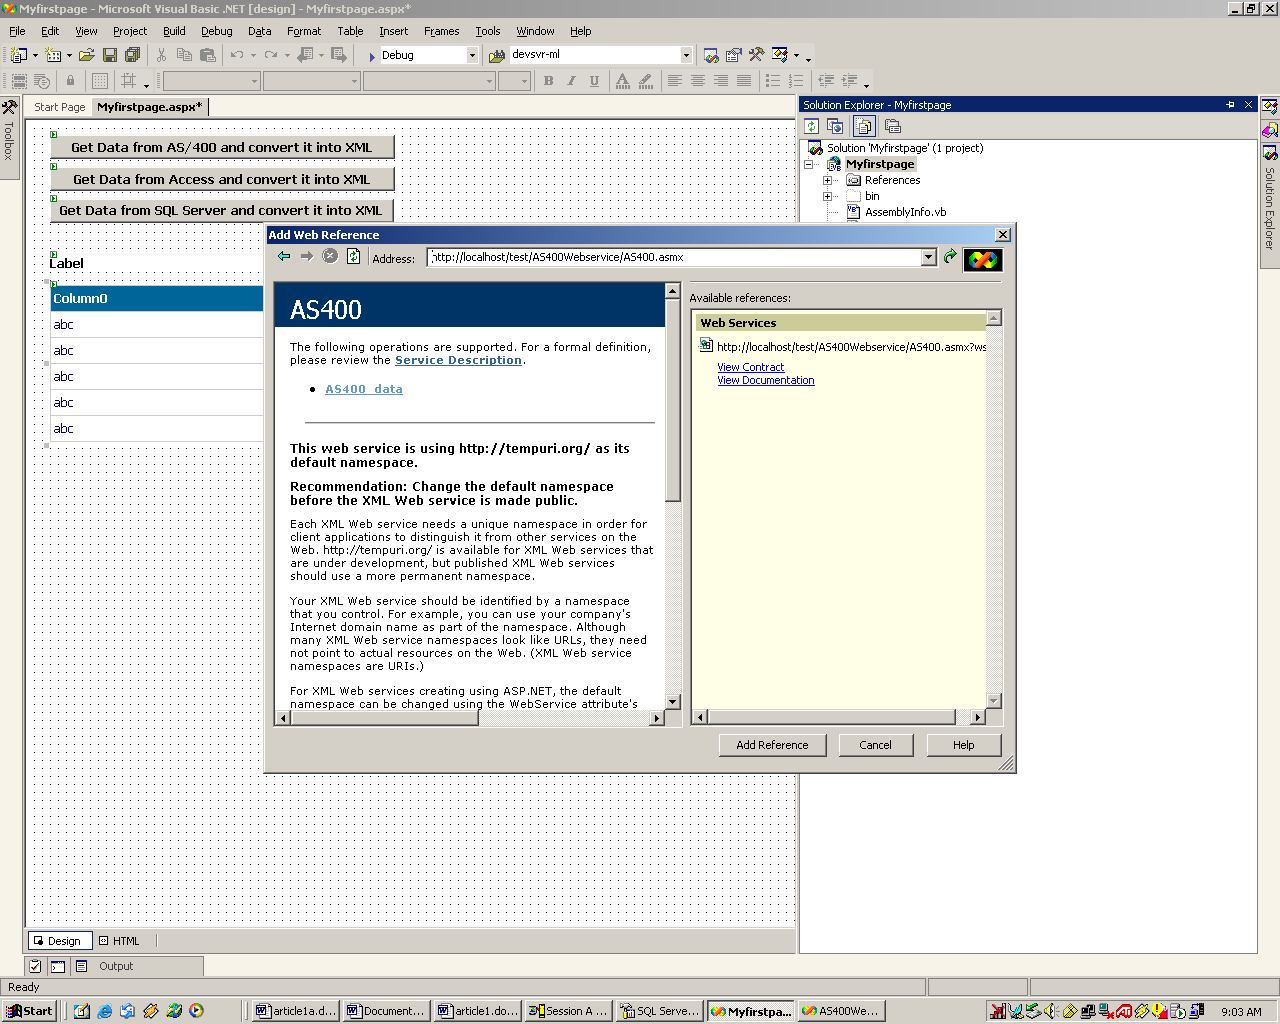 http://www.mcpressonline.com/articles/images/2002/article_final--Malik062104--ConvertToXML%20V403.png